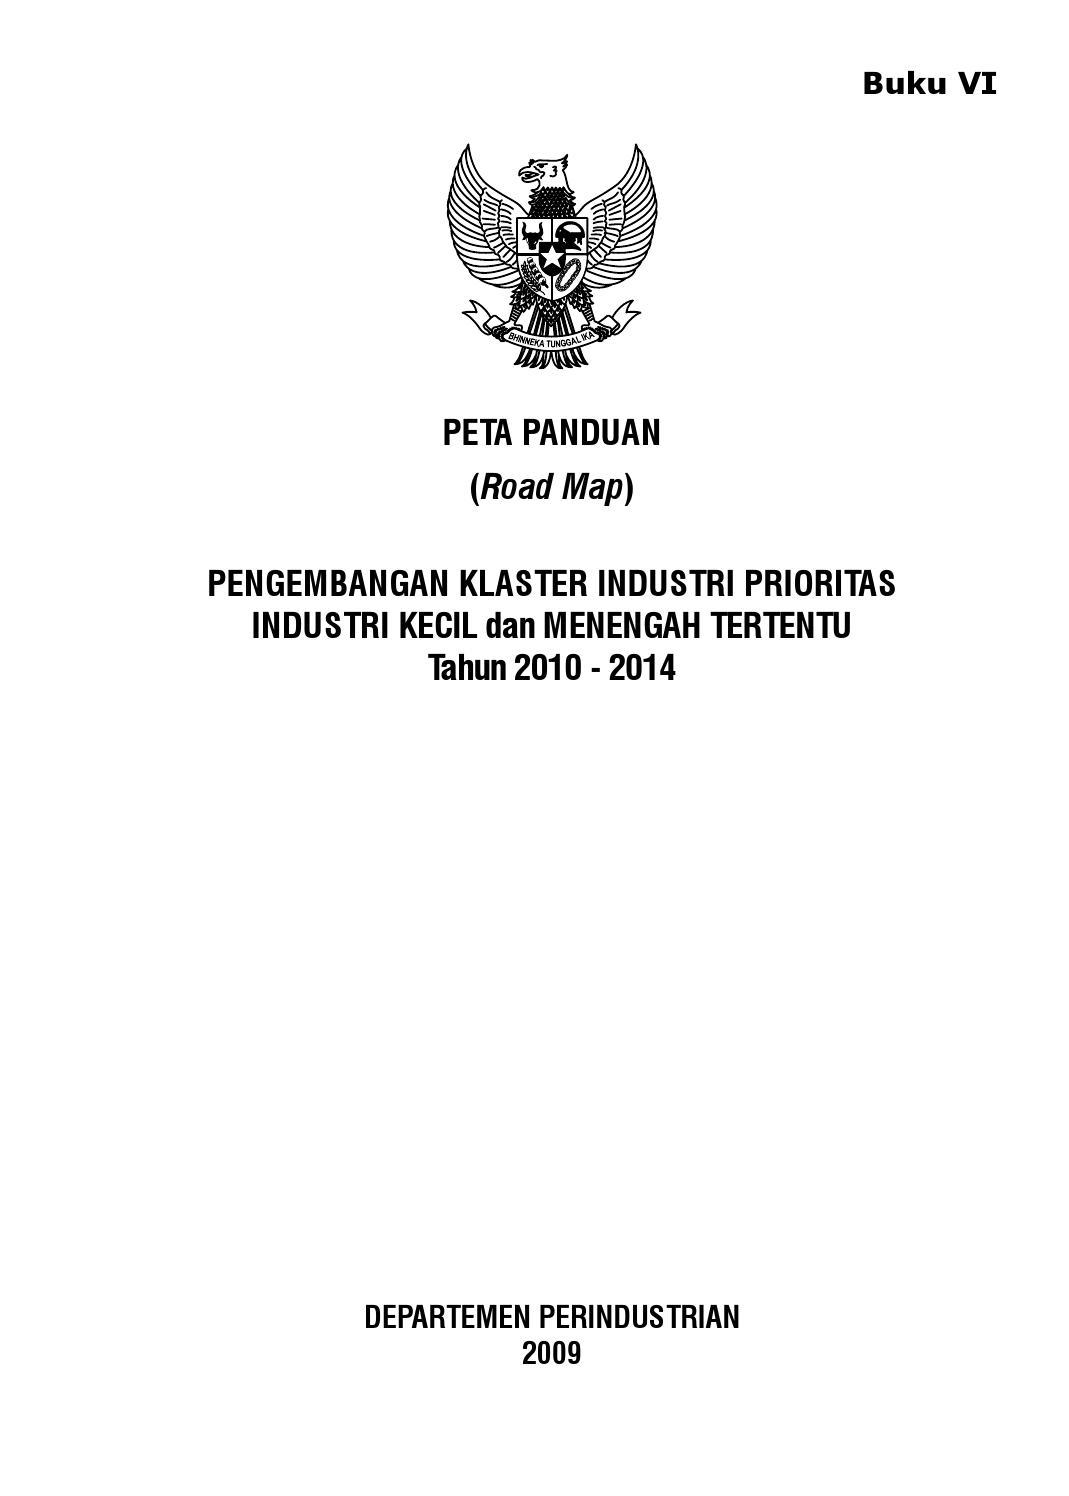 Buku 6 Prioritas Industri Kecil Dan Menengah By Fakhrur Issuu Produk Ukm Bumn Cemilan Jagung Emping Isi 3